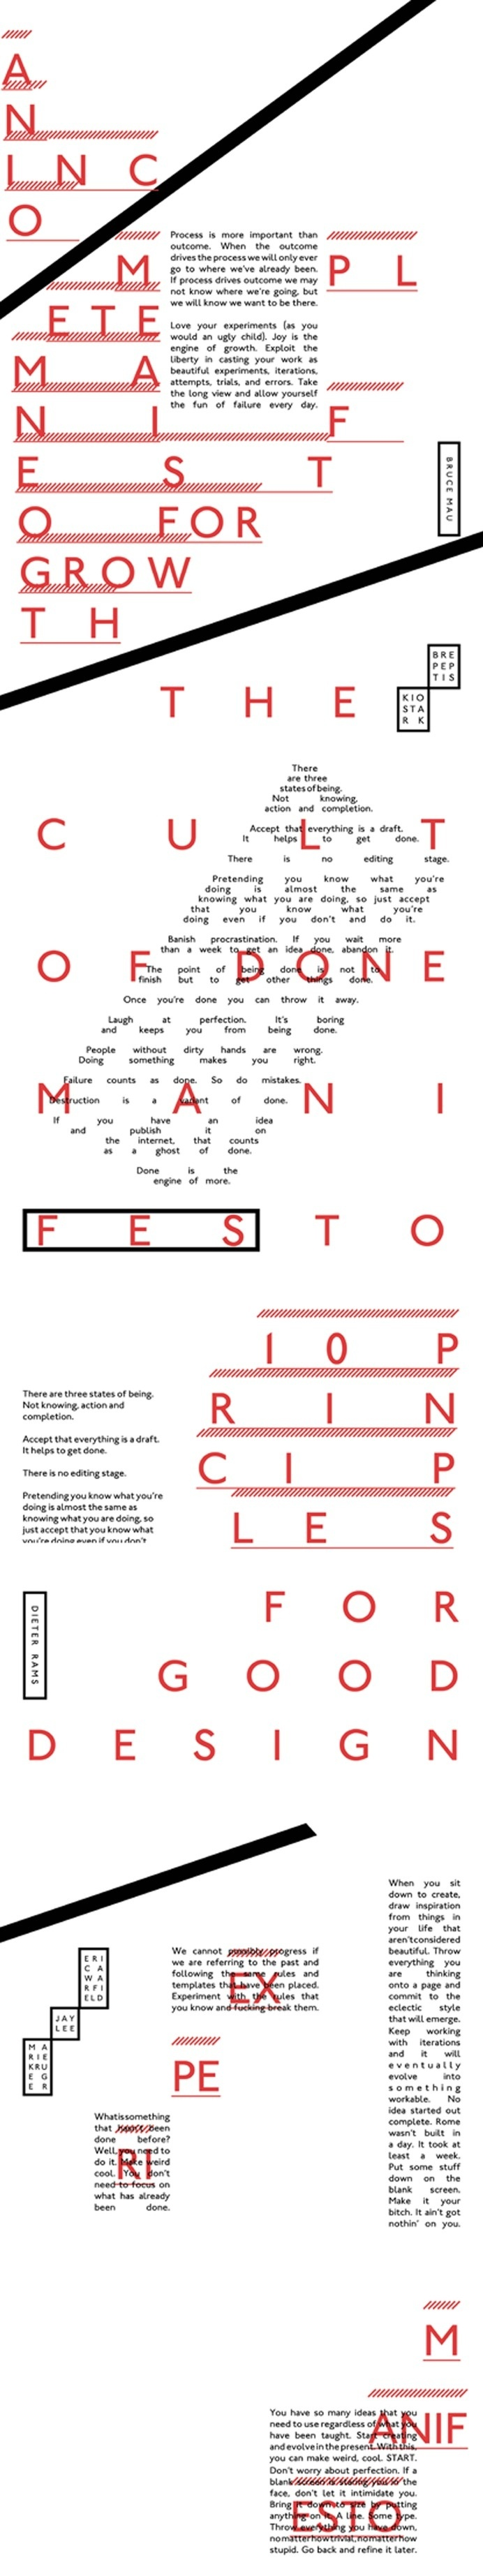 iPad magazine design manifesto #experimental #experiment #typography #layout #design #interactive #red #black #kerning #letting #erica warfi